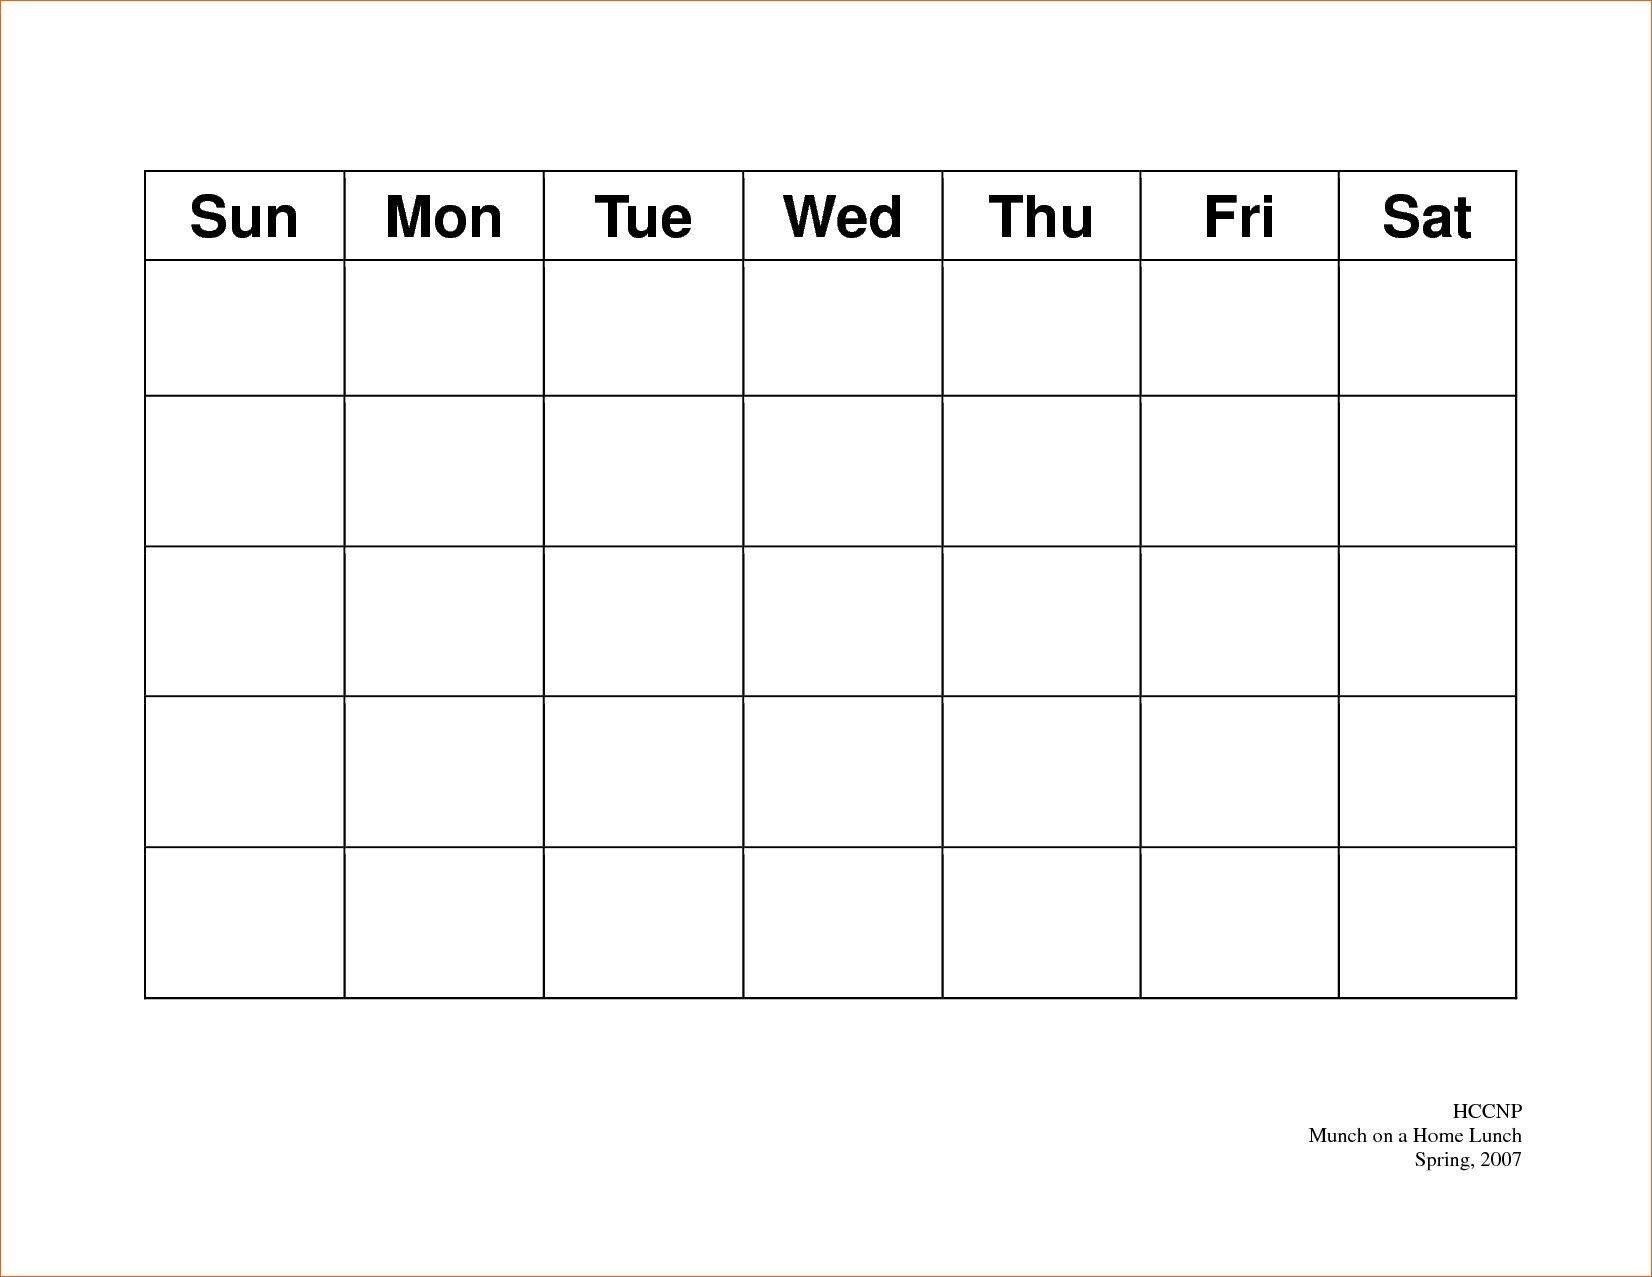 Calendar 5 Day Weekly Calendar Template On 5 Week Calendar-5 Day Week Calender Template